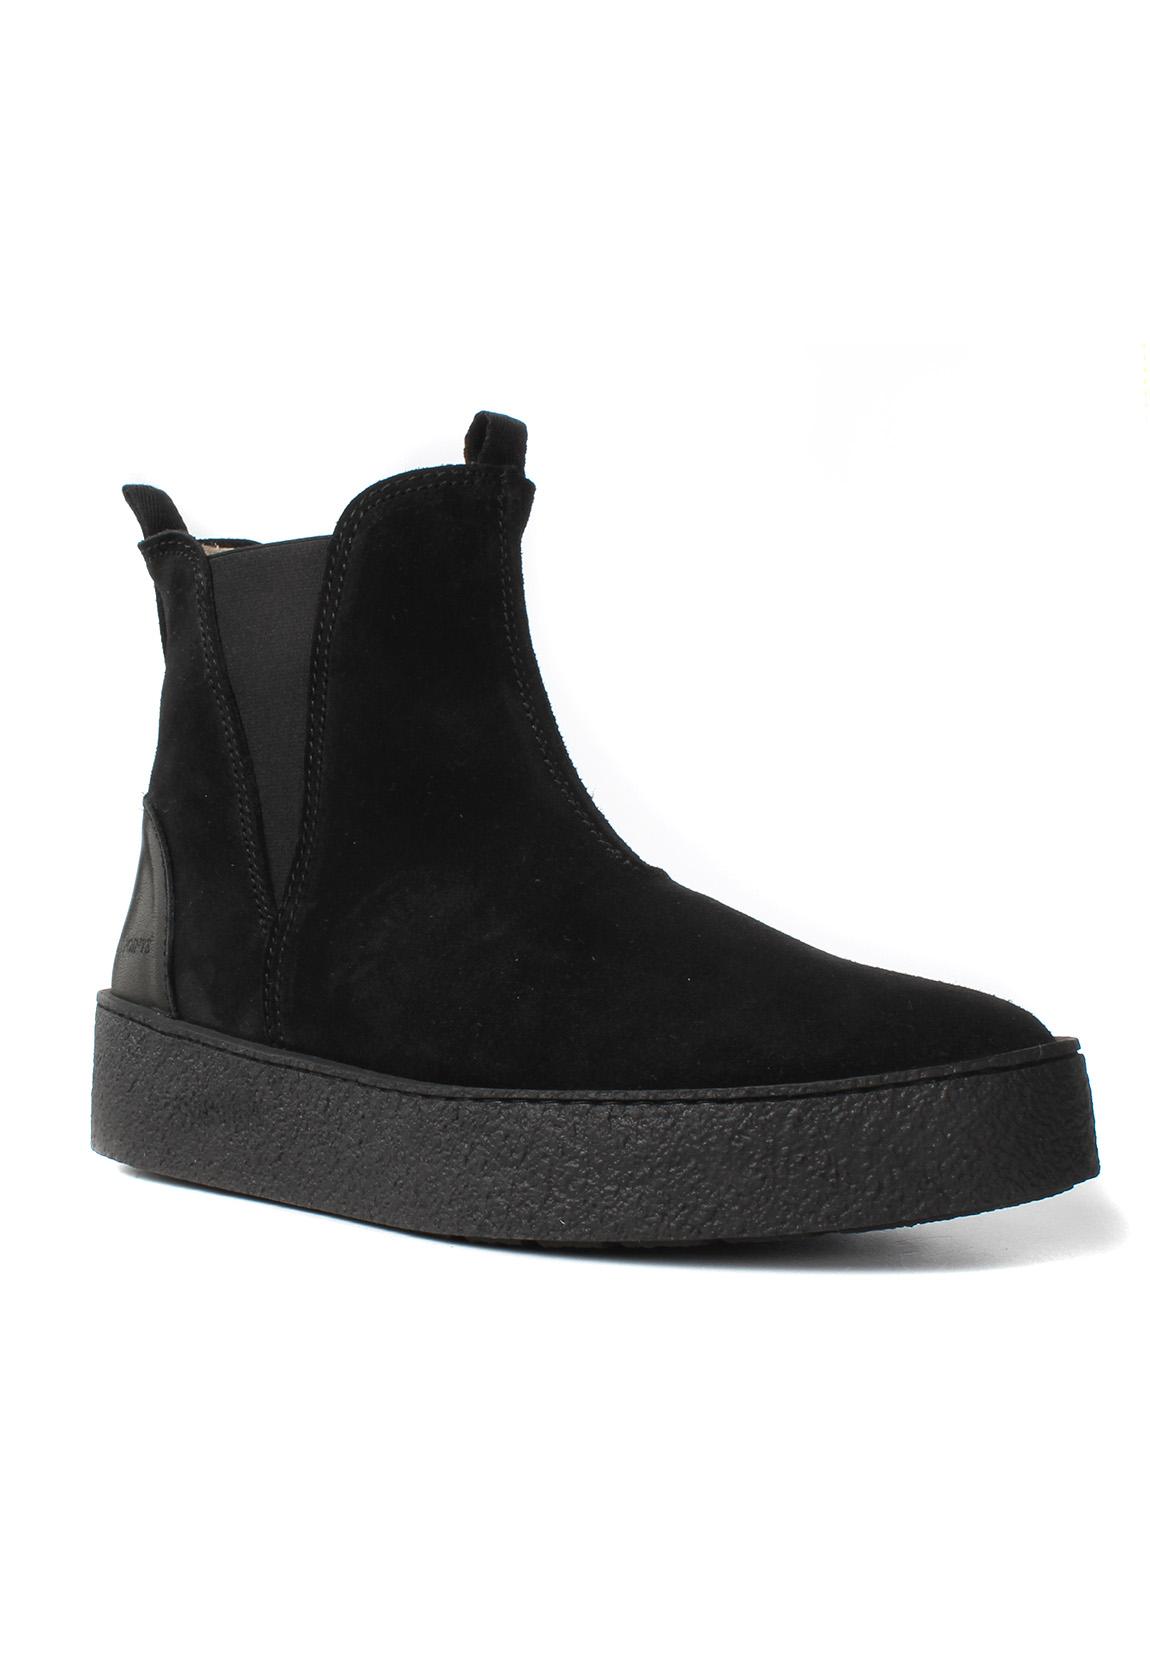 Ten Points Chelsea Boots Women JOHANNA 266002 Schwarz Black 101